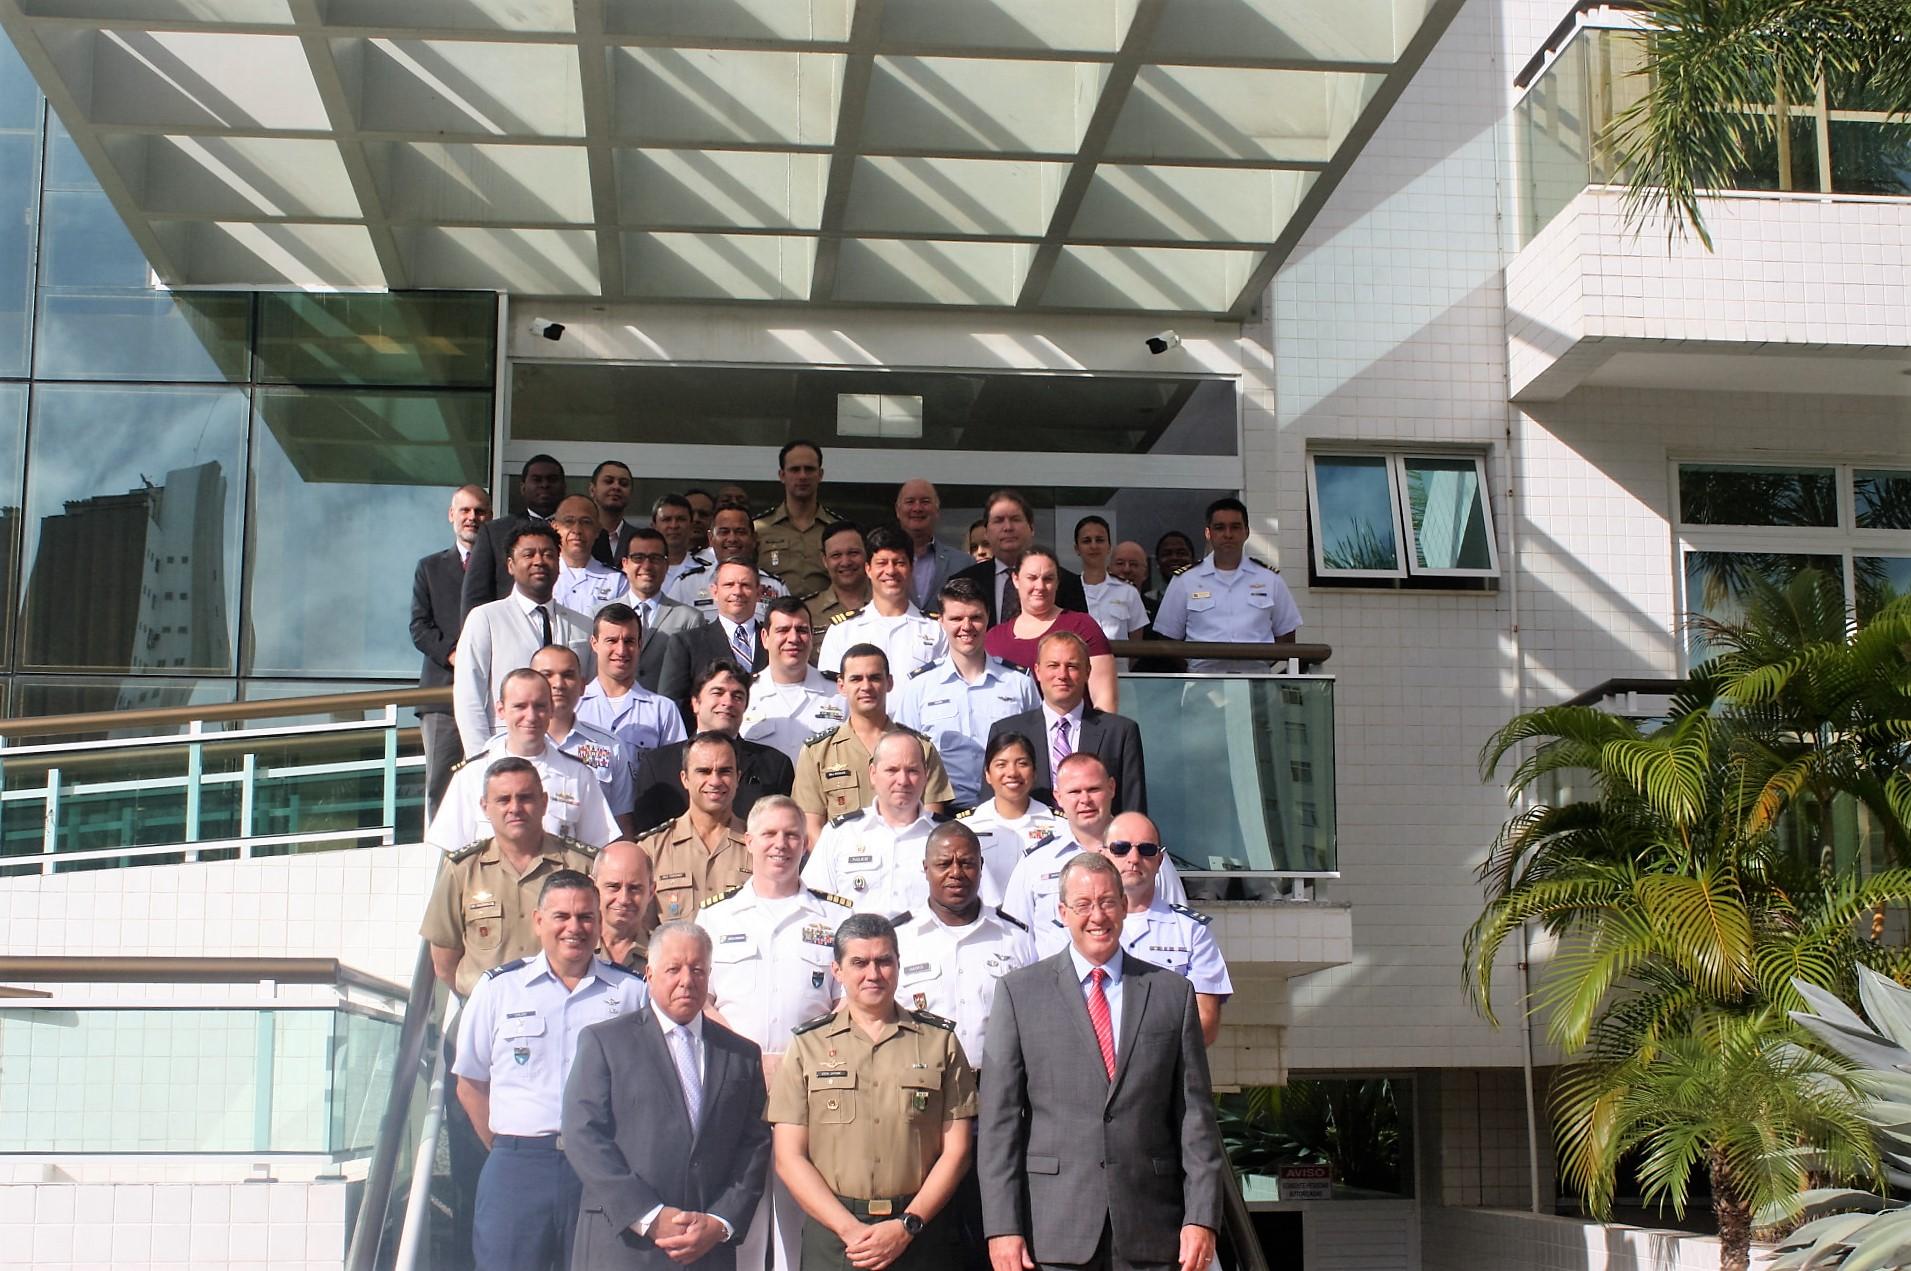 Brazil-U.S. Interoperability Builds Trust